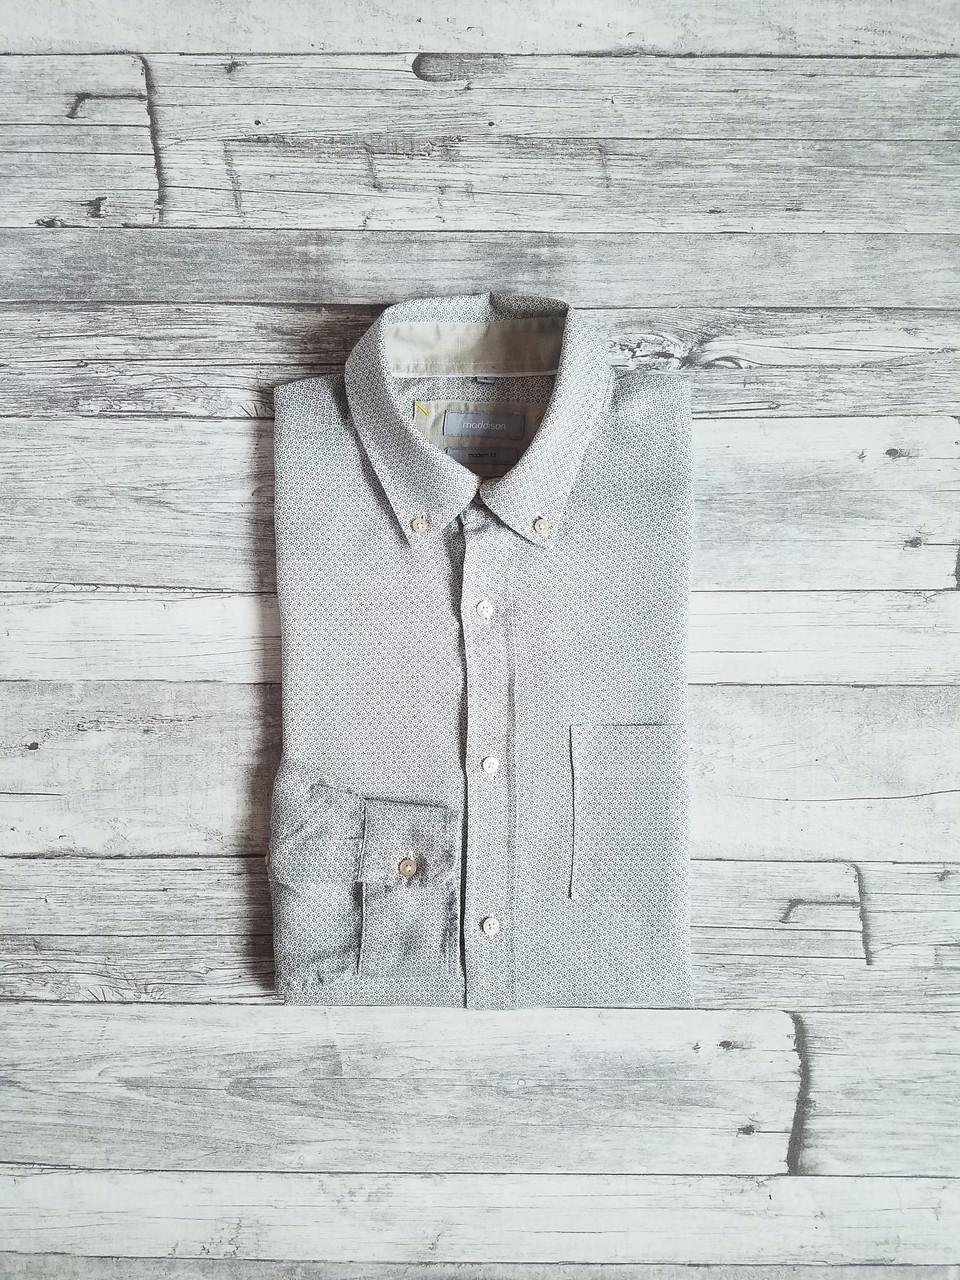 14f01492c9e Мужская льняная рубашка Maddison (L 50) - Brand Stocker в Киеве